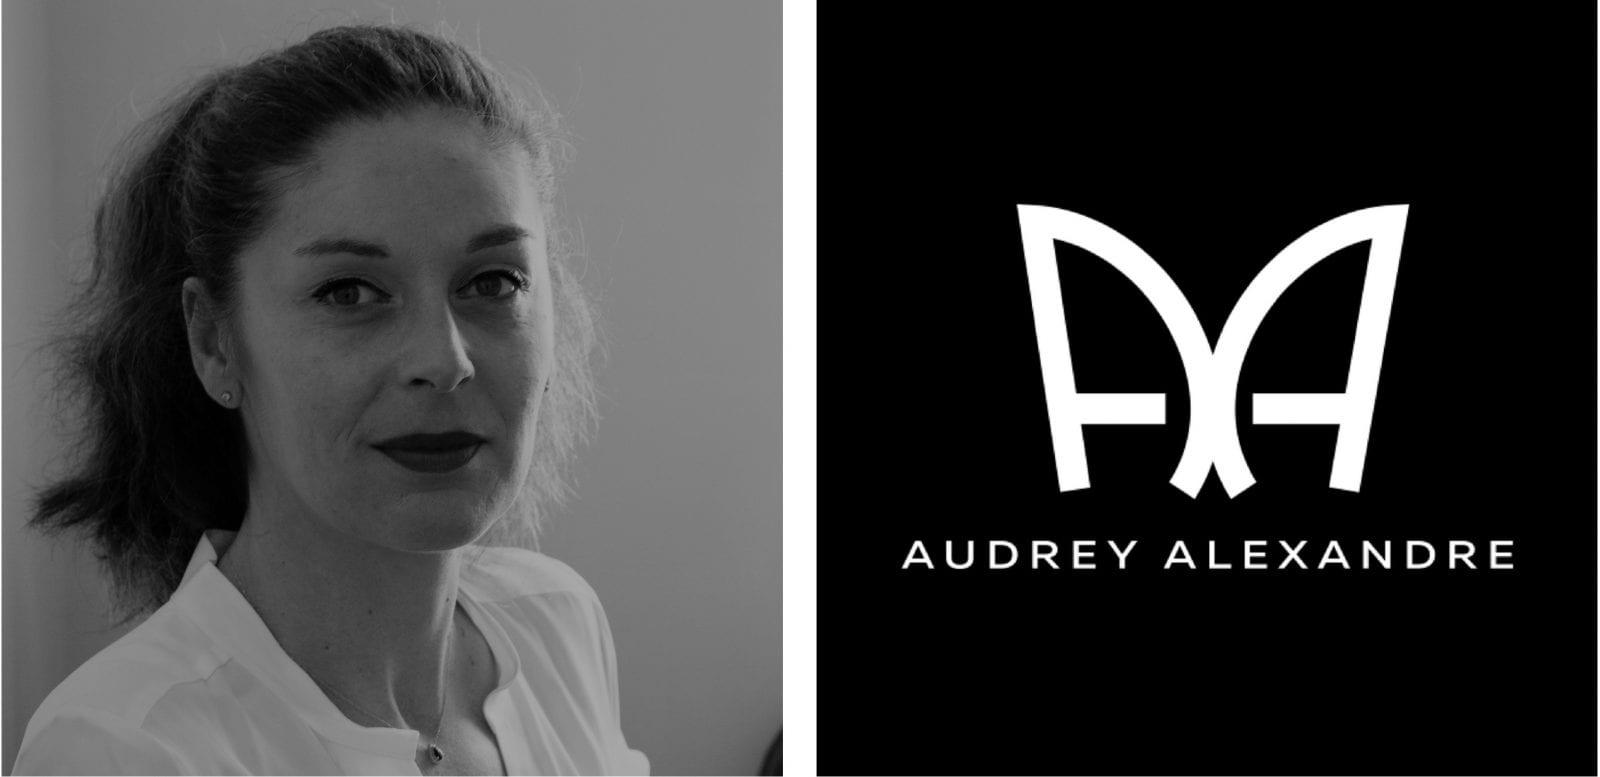 Audrey alexandre